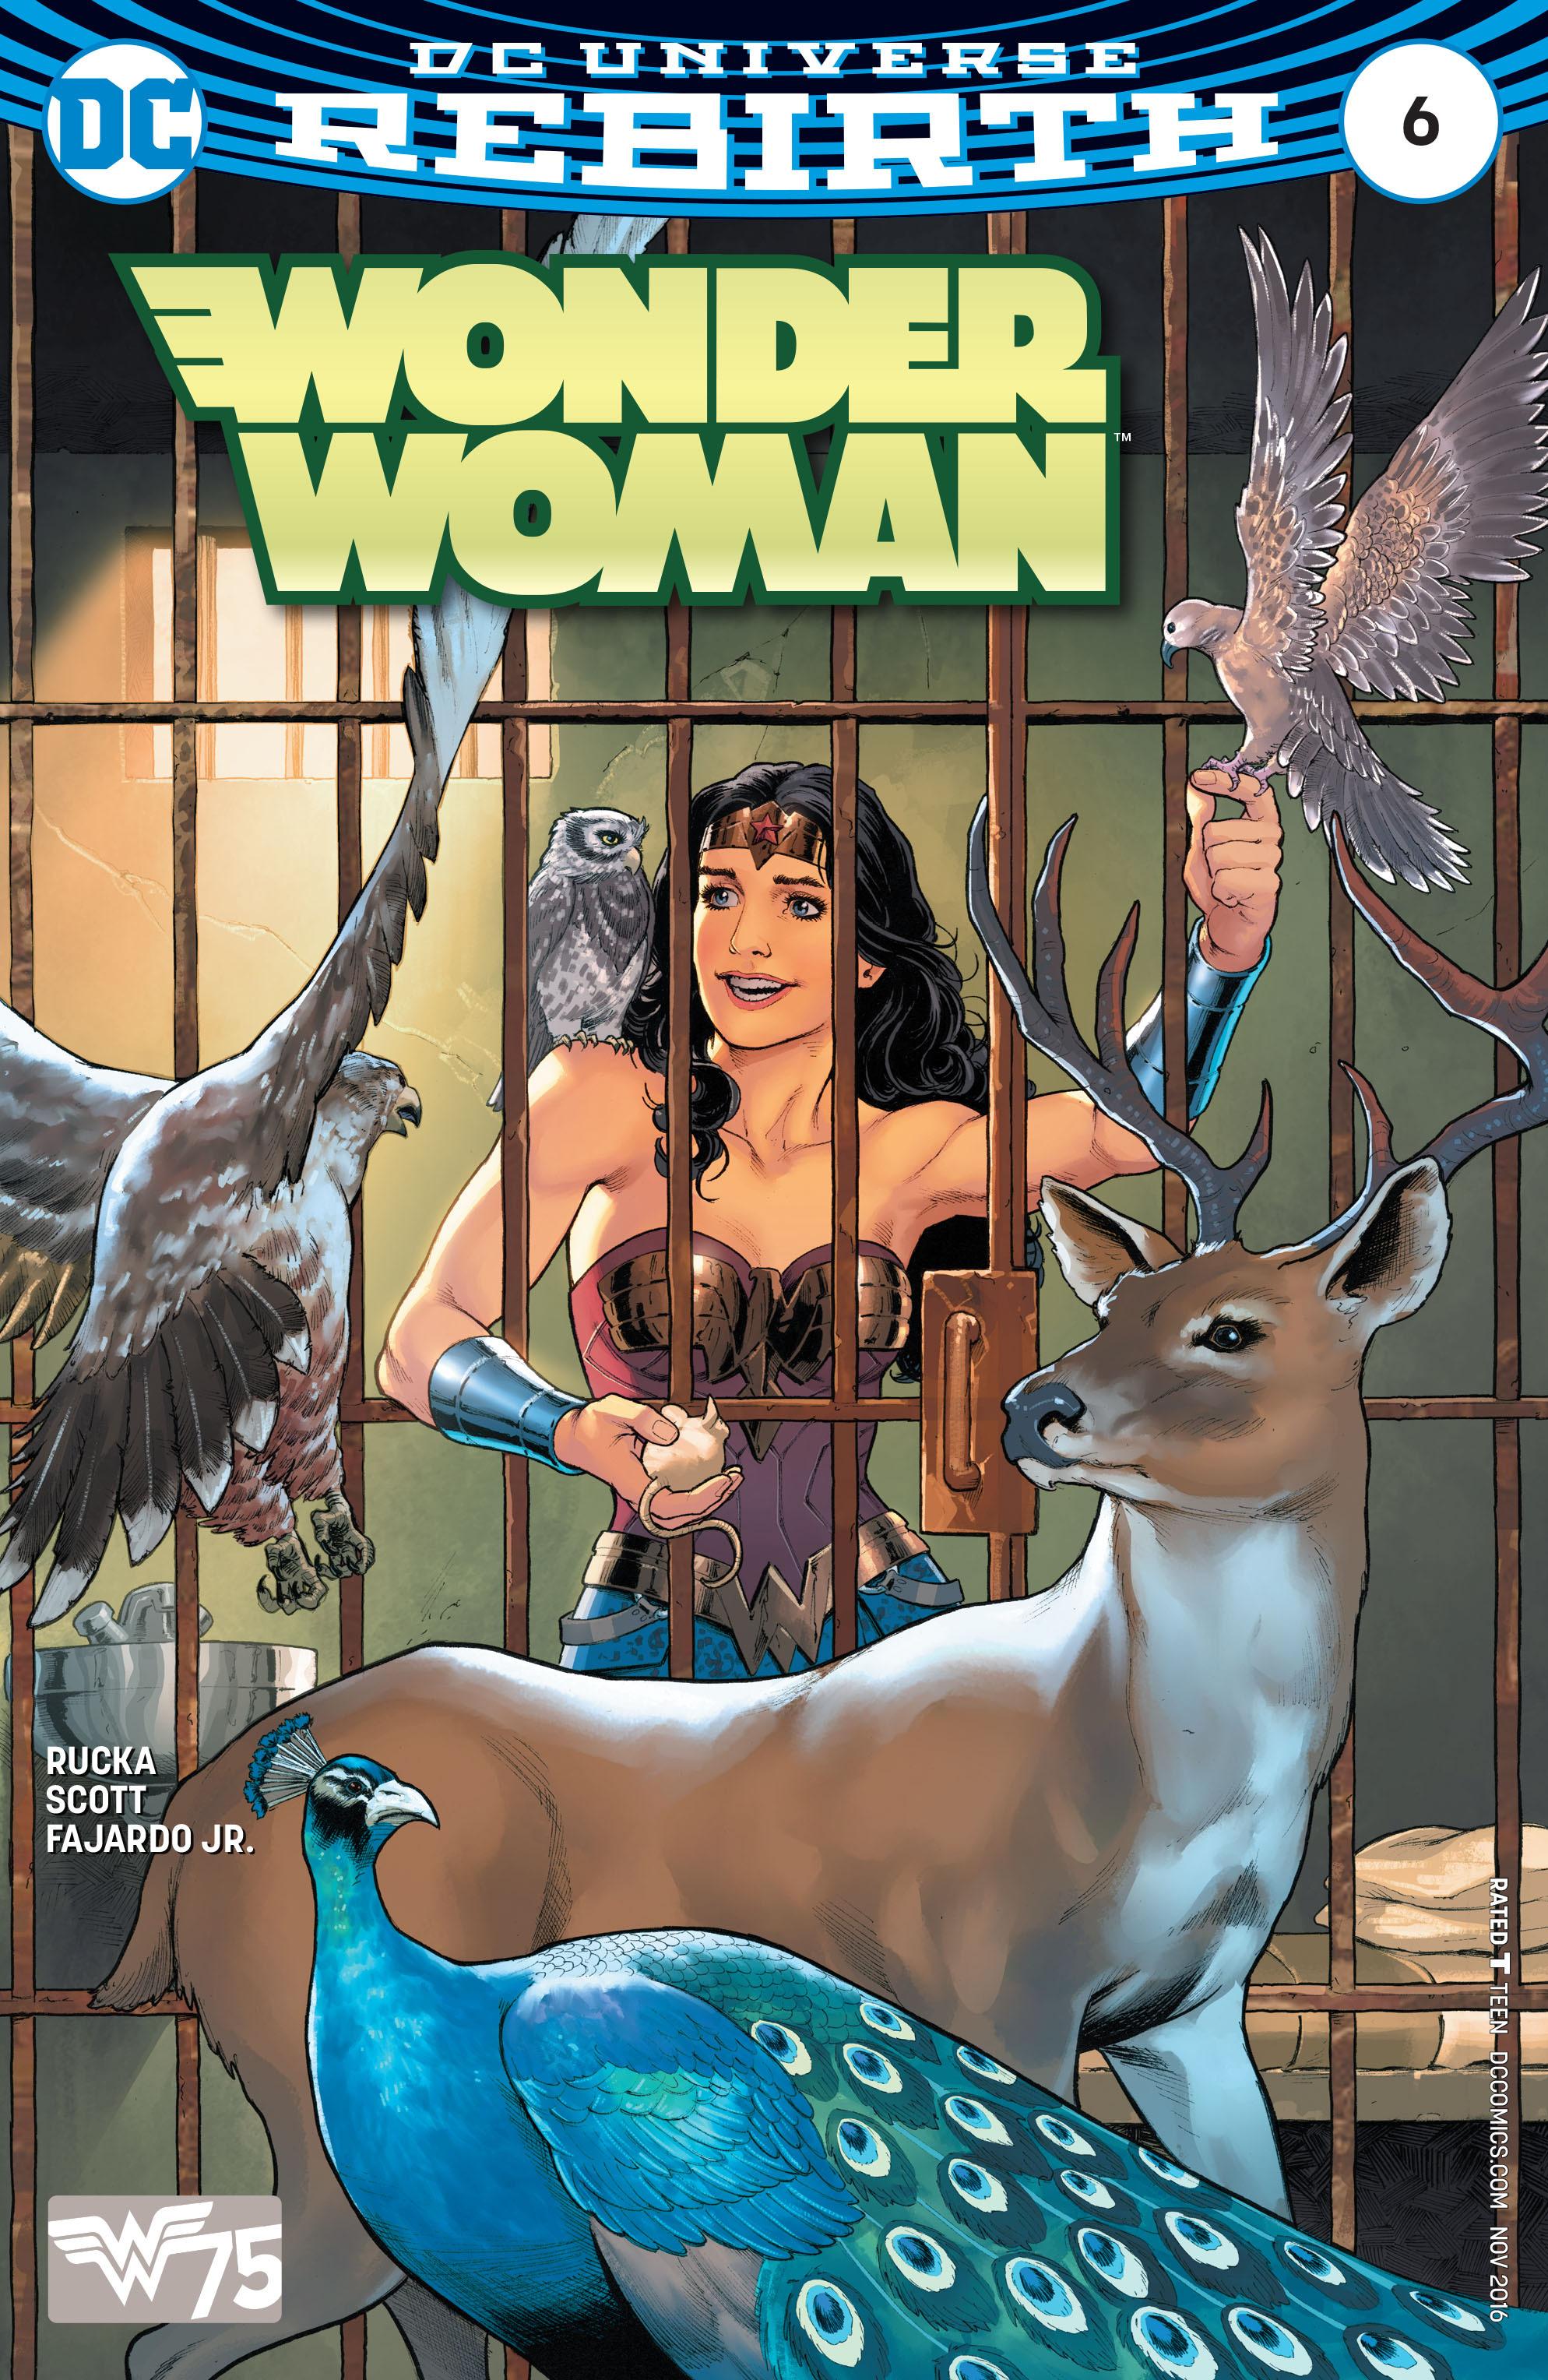 Read online Wonder Woman (2016) comic -  Issue #6 - 1